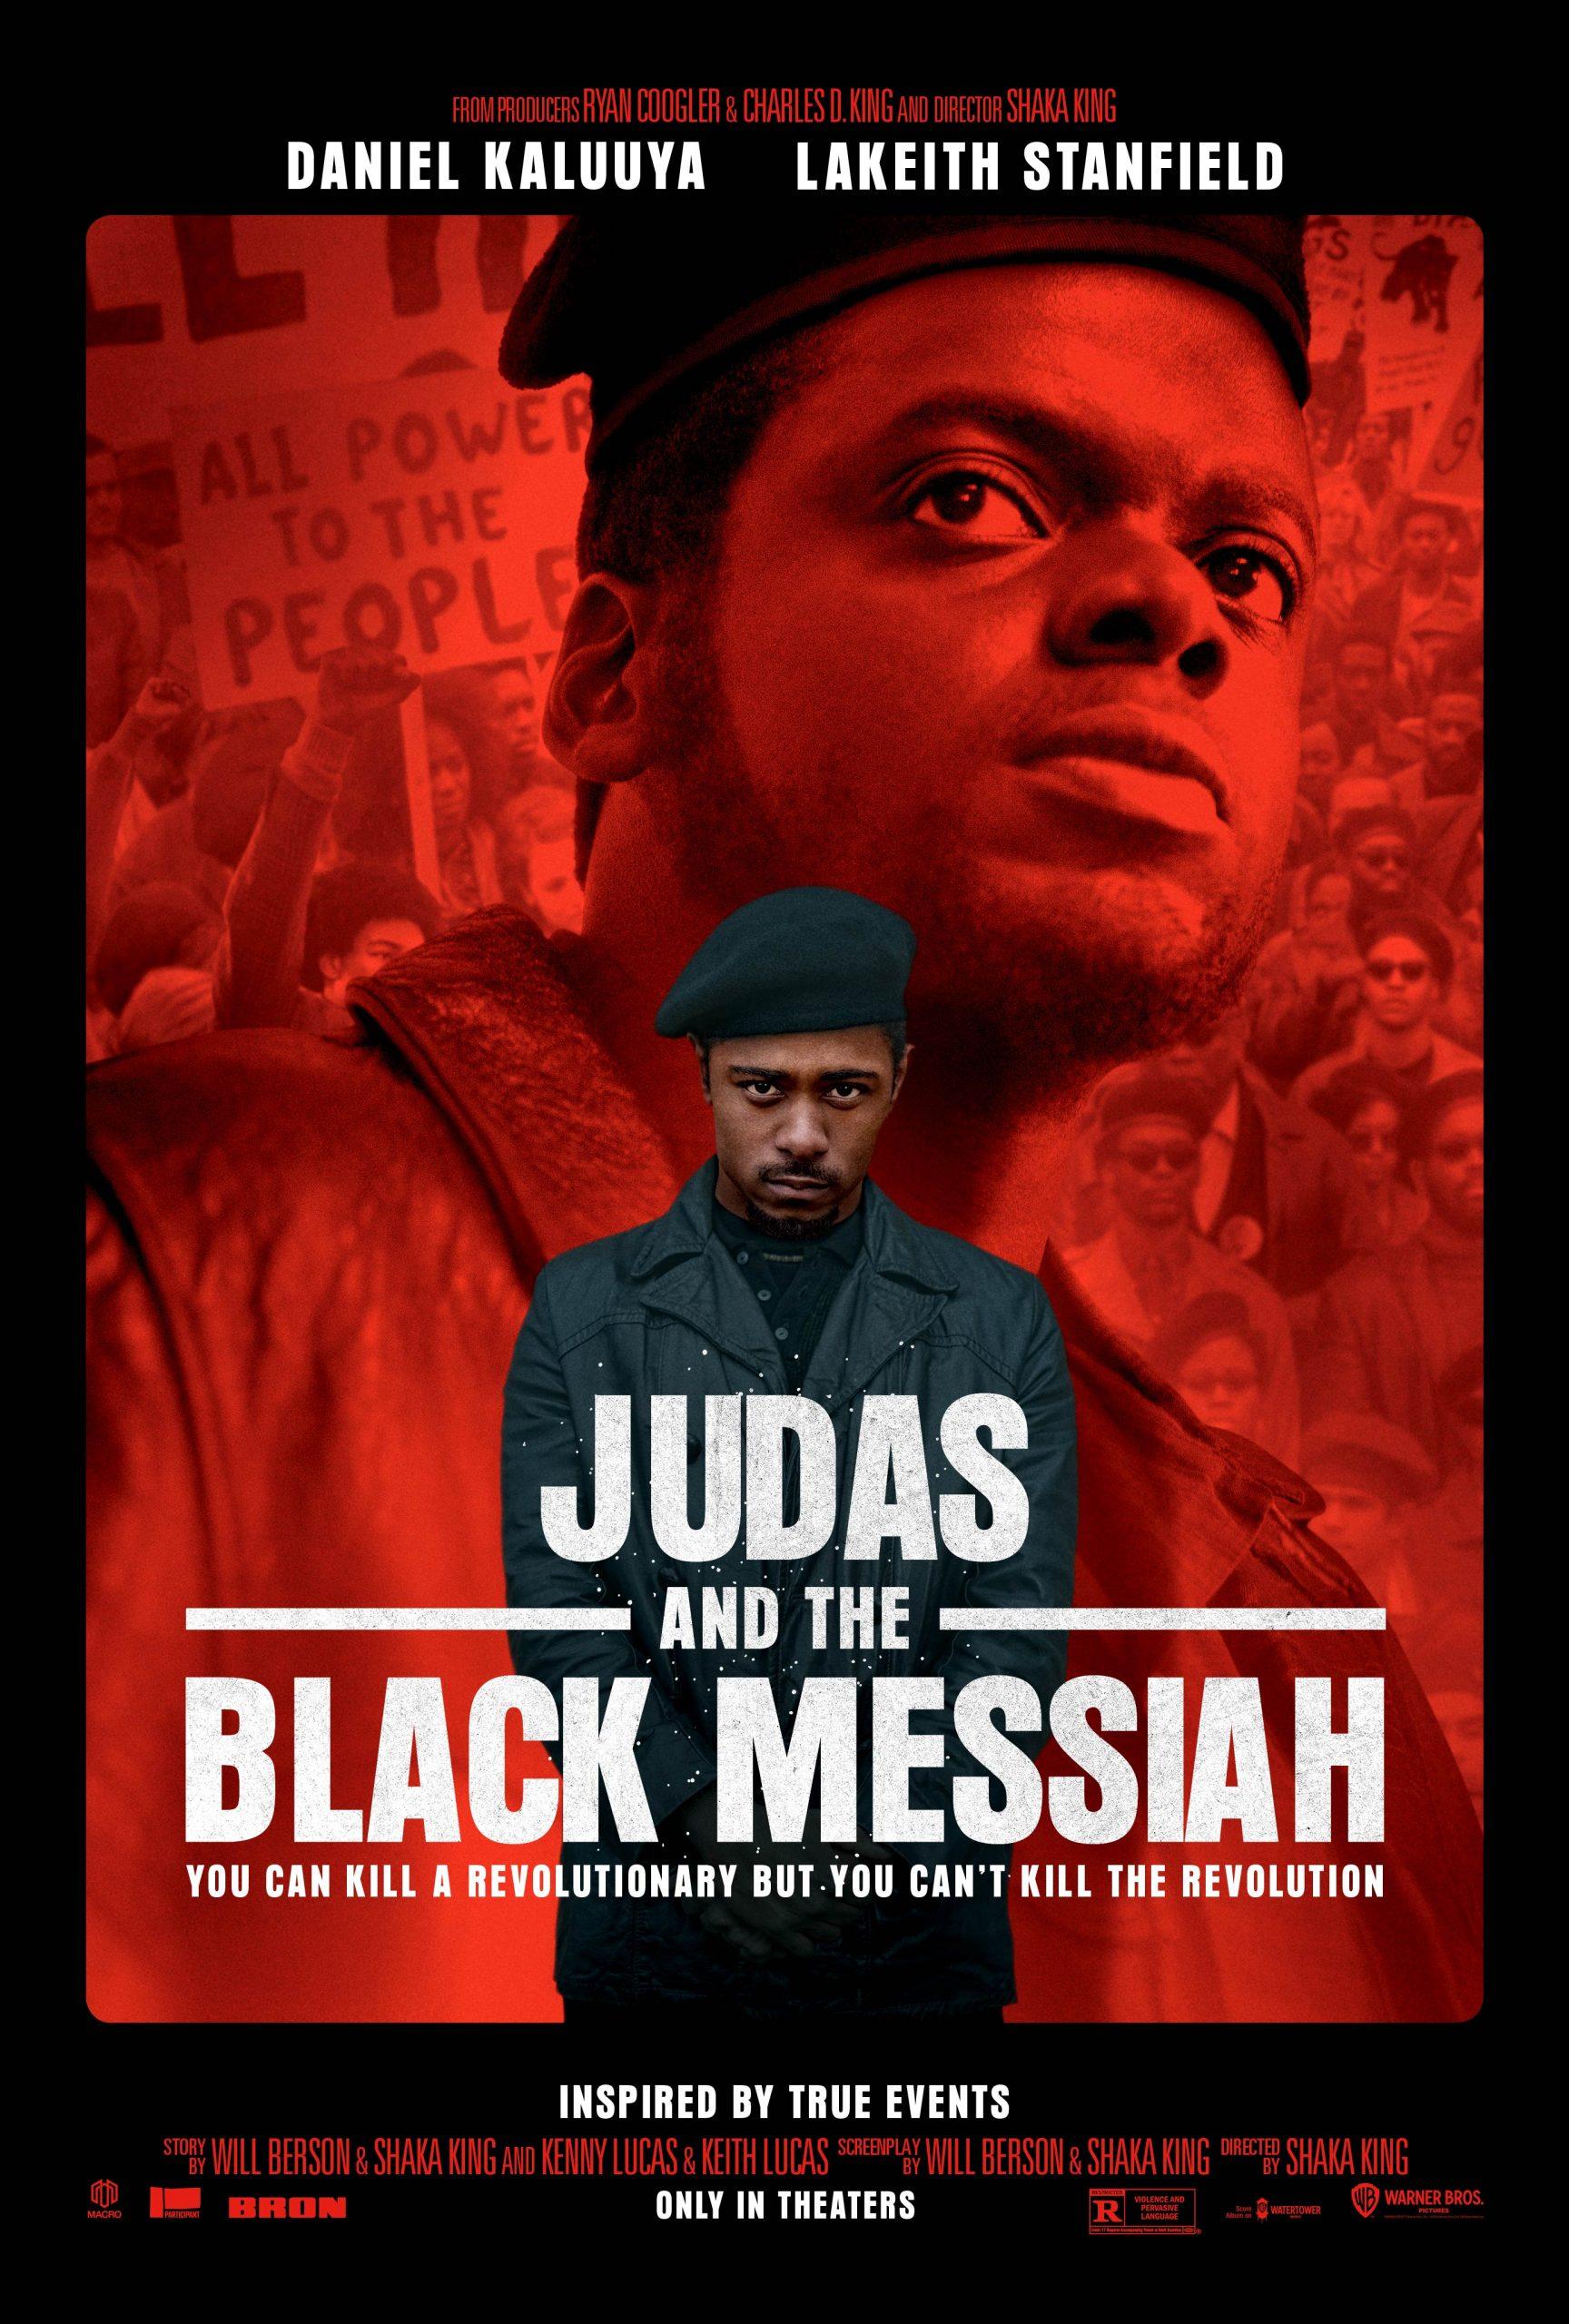 New Movie: JUDAS AND THE BLACK MESSIAH Starring Daniel Kaluuya